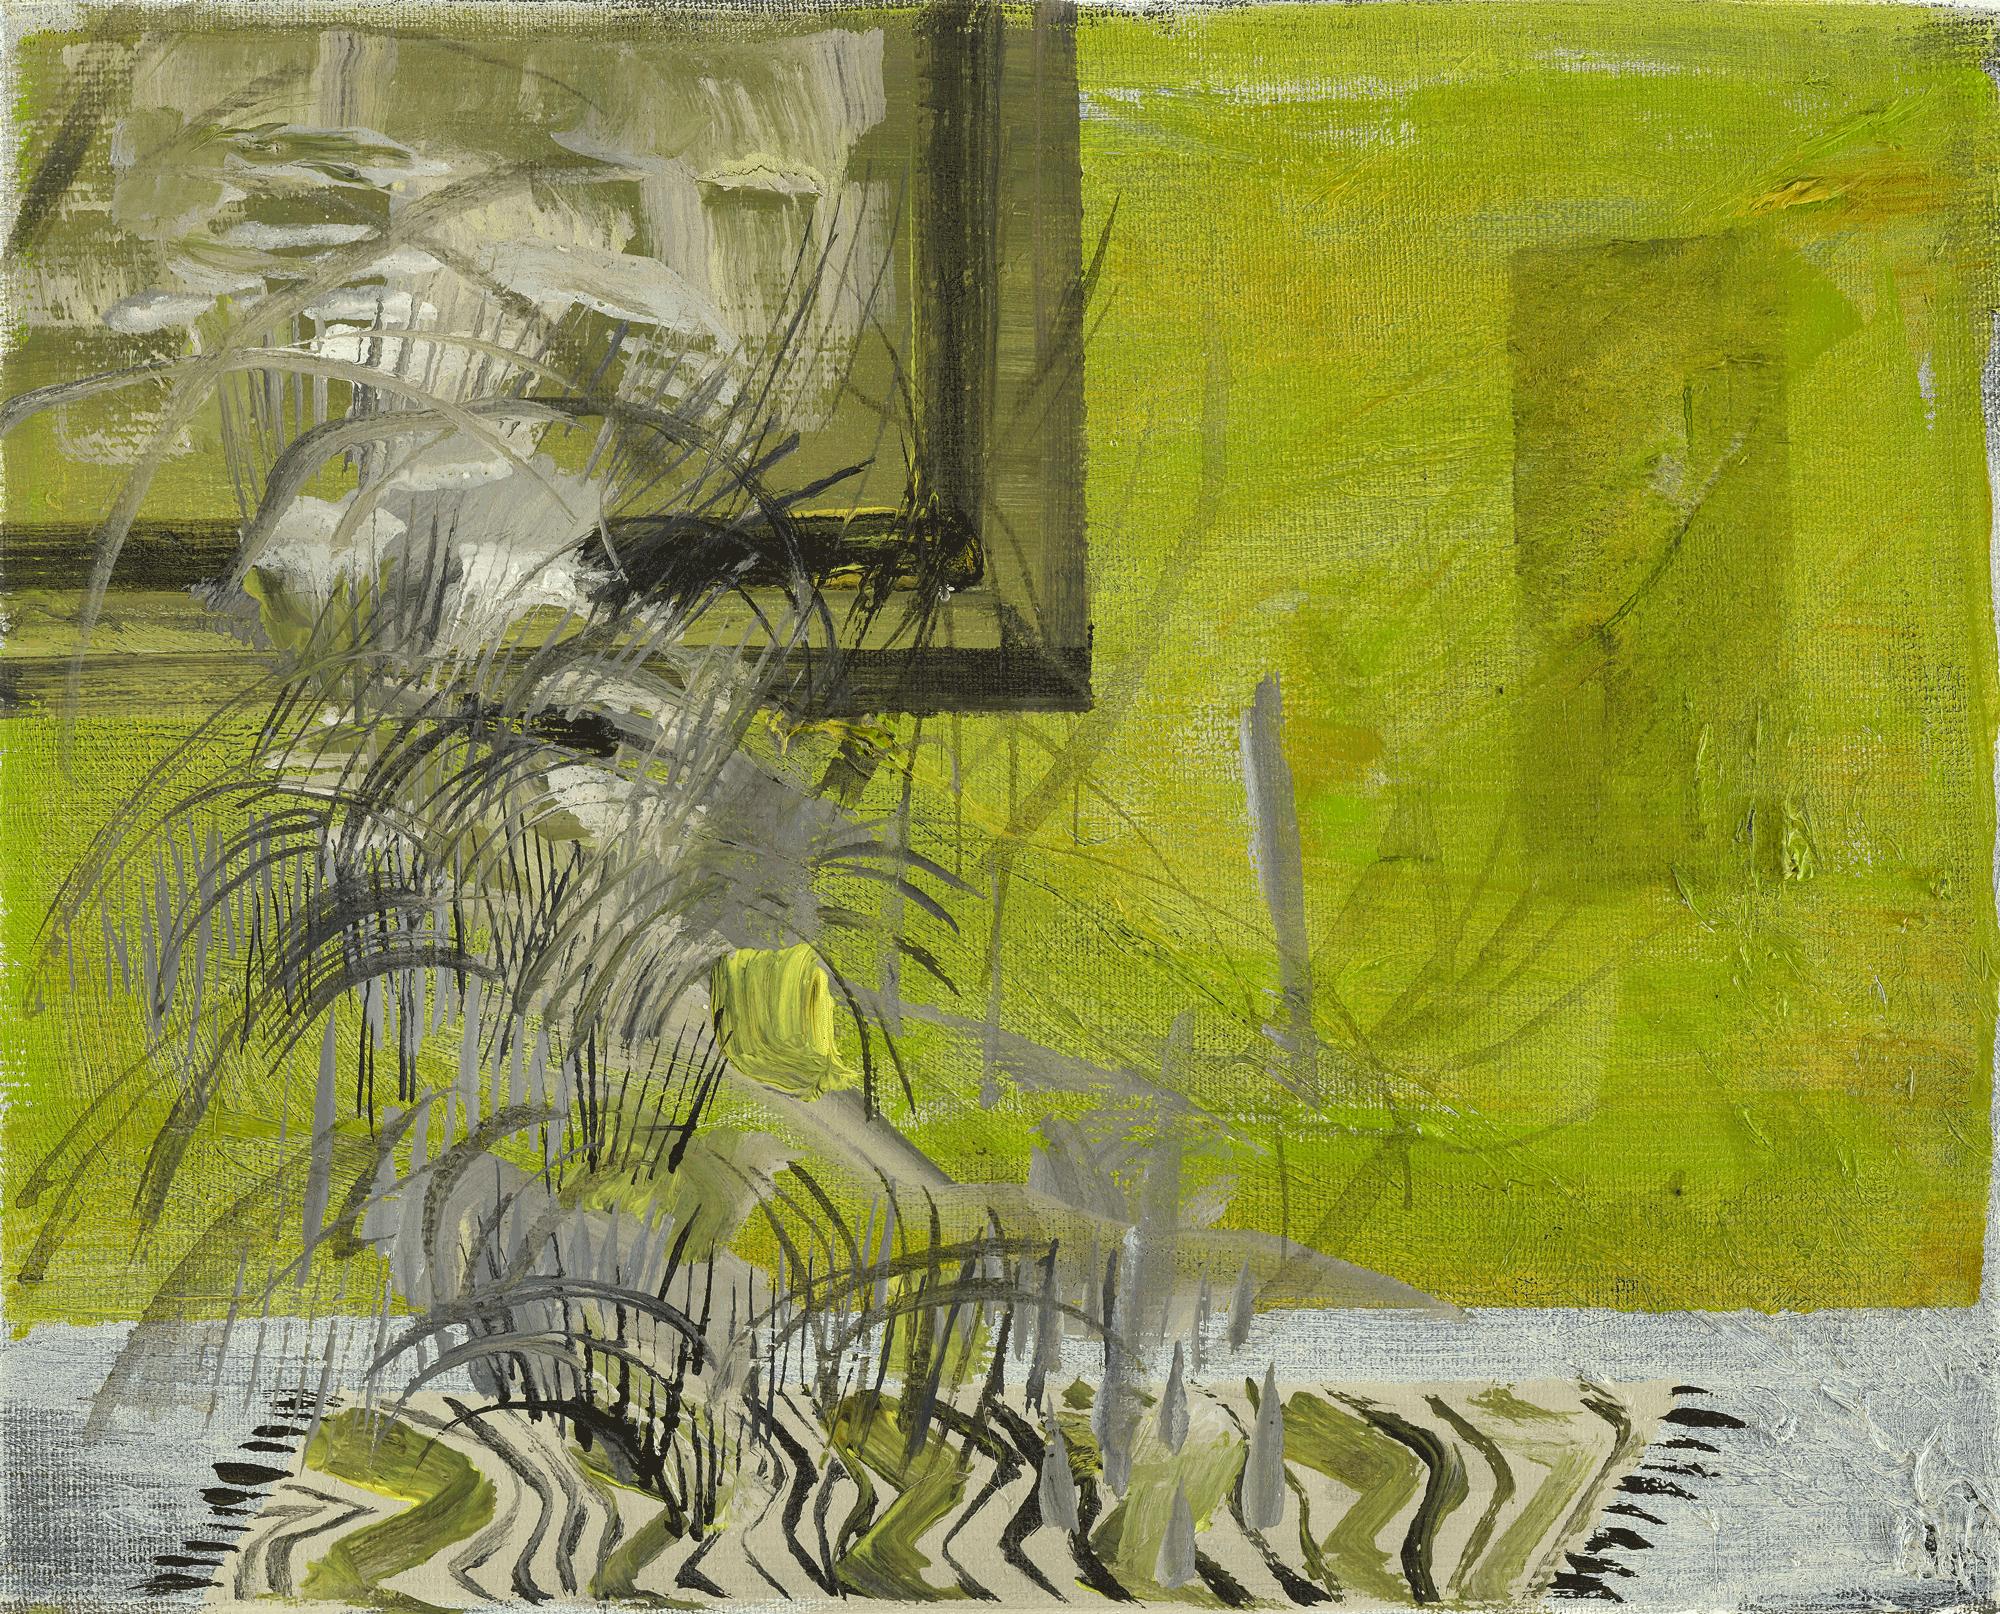 Yvonne Andreini, Insideout Teppich I, 2021, 24 x 30cm, Tusche und Acryl auf Leinwand